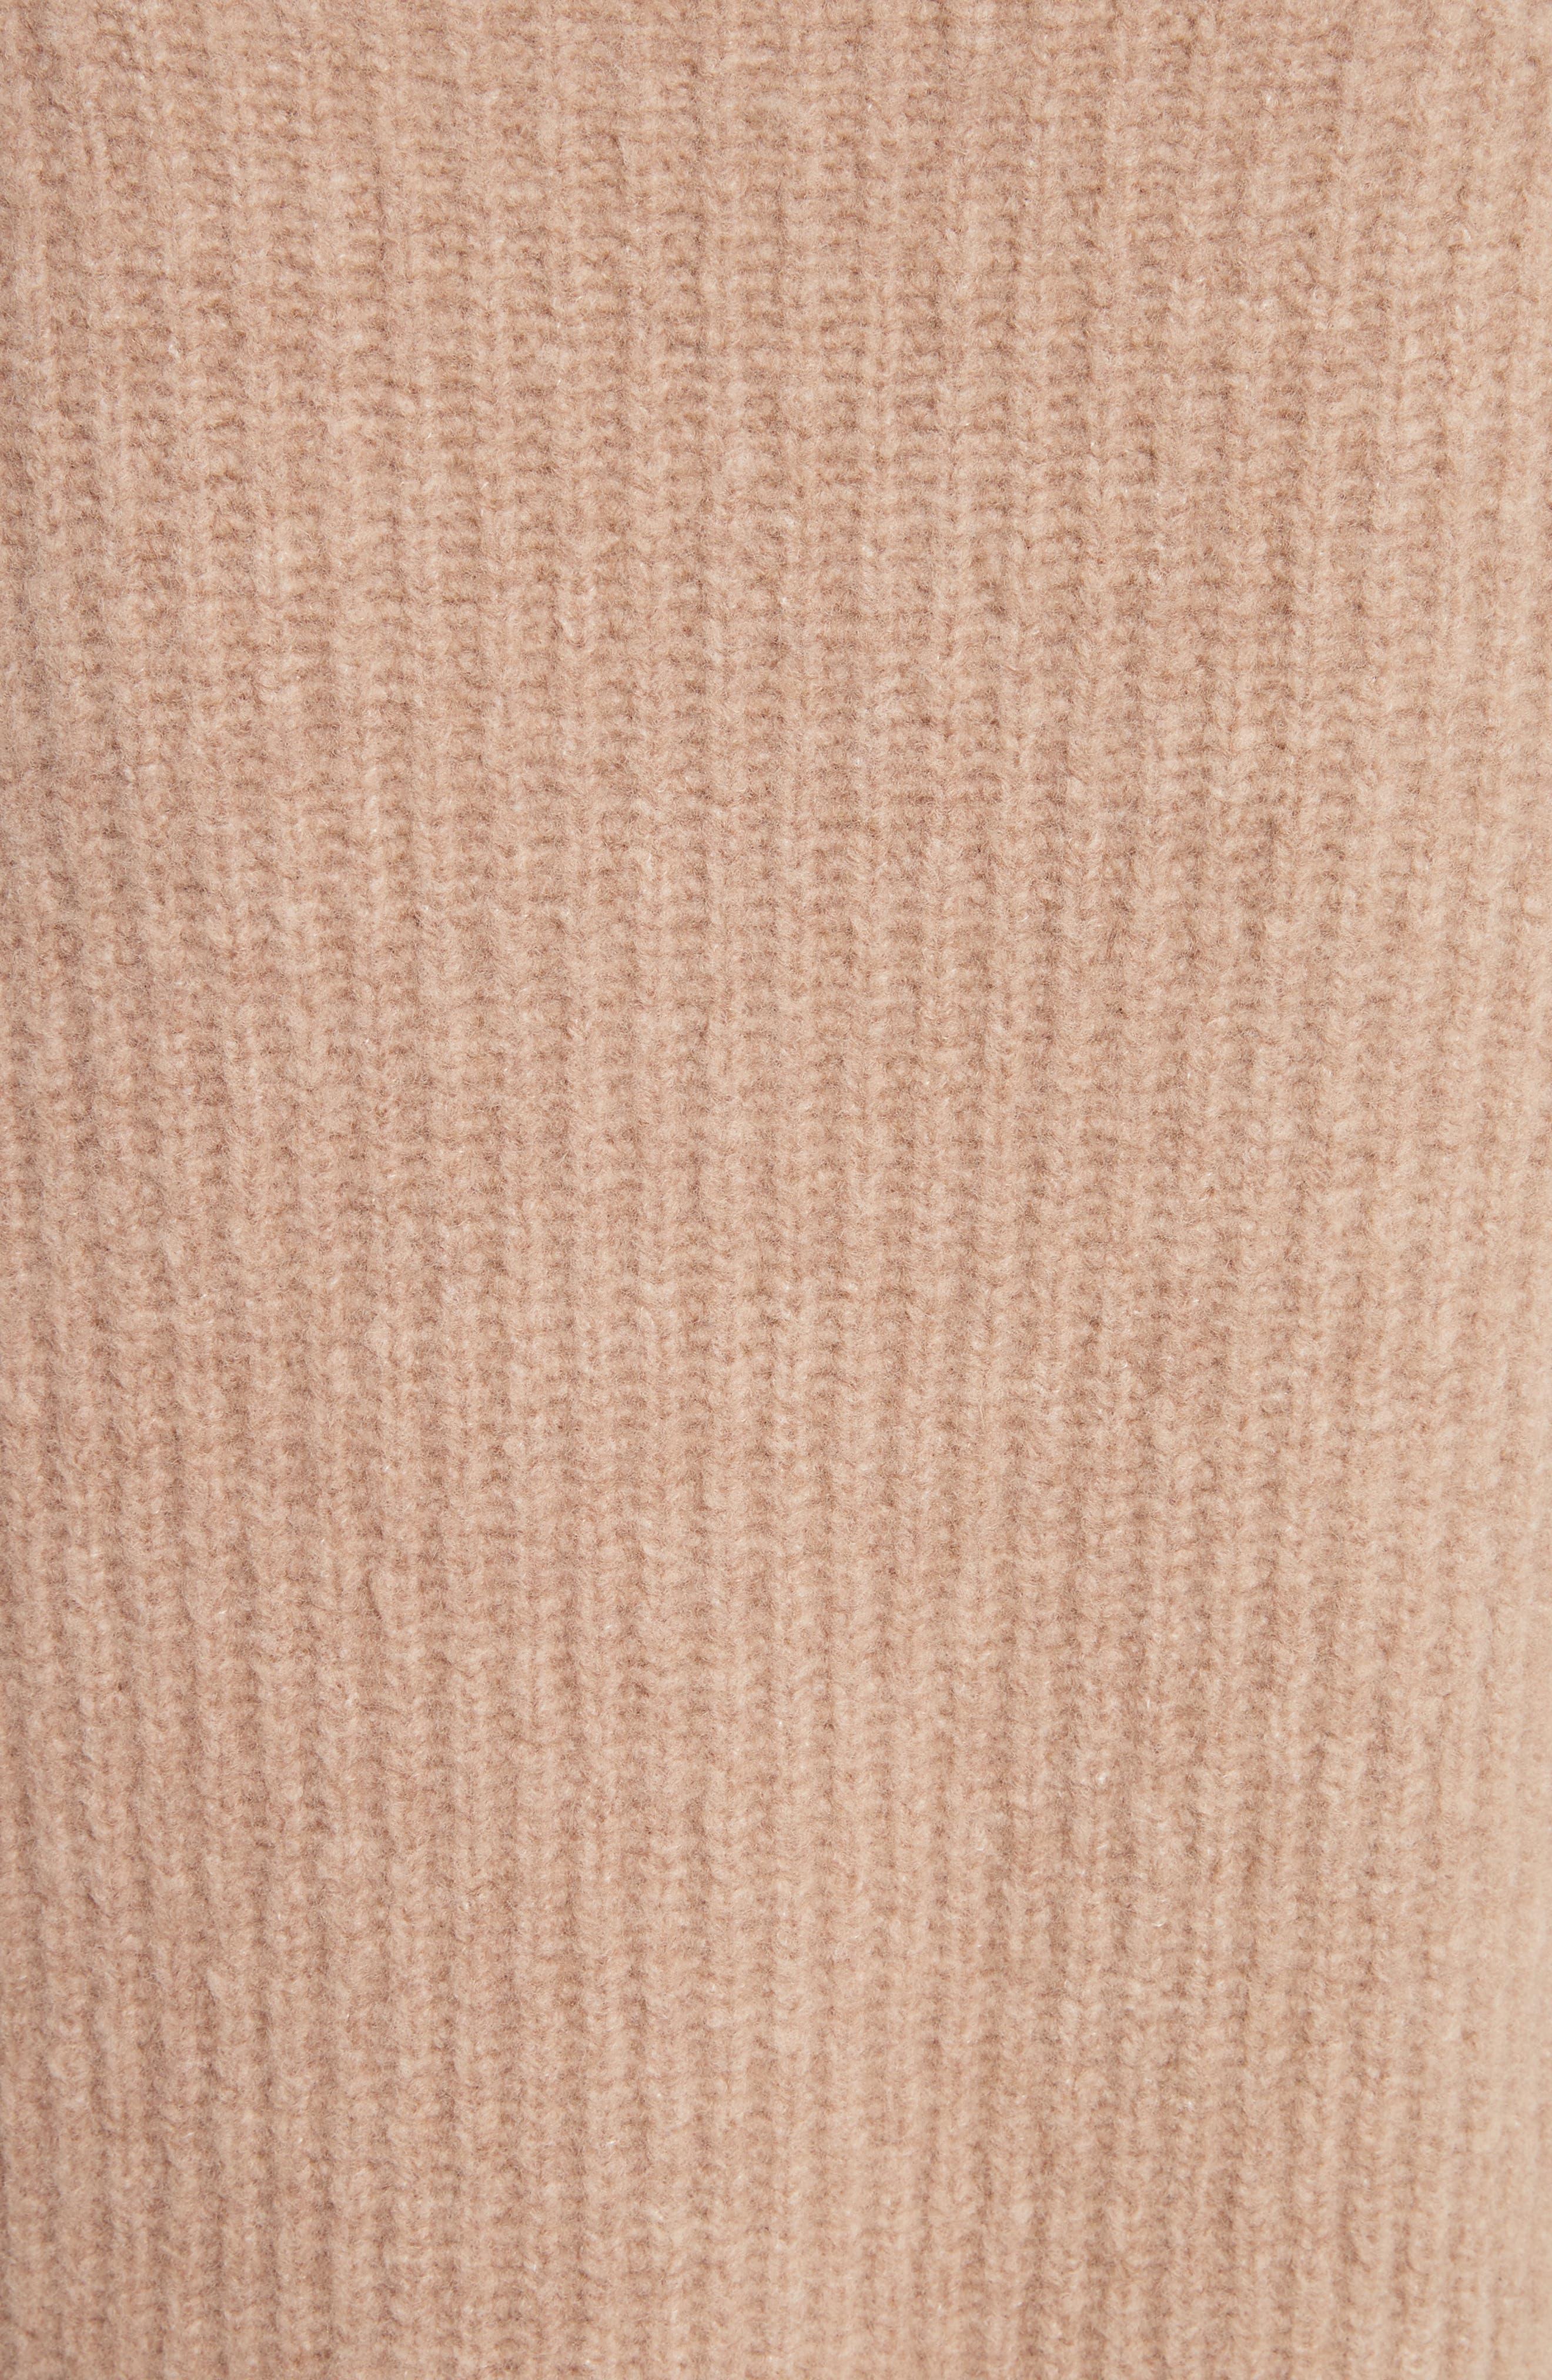 Francie Merino Wool Blend Sweater,                             Alternate thumbnail 5, color,                             230